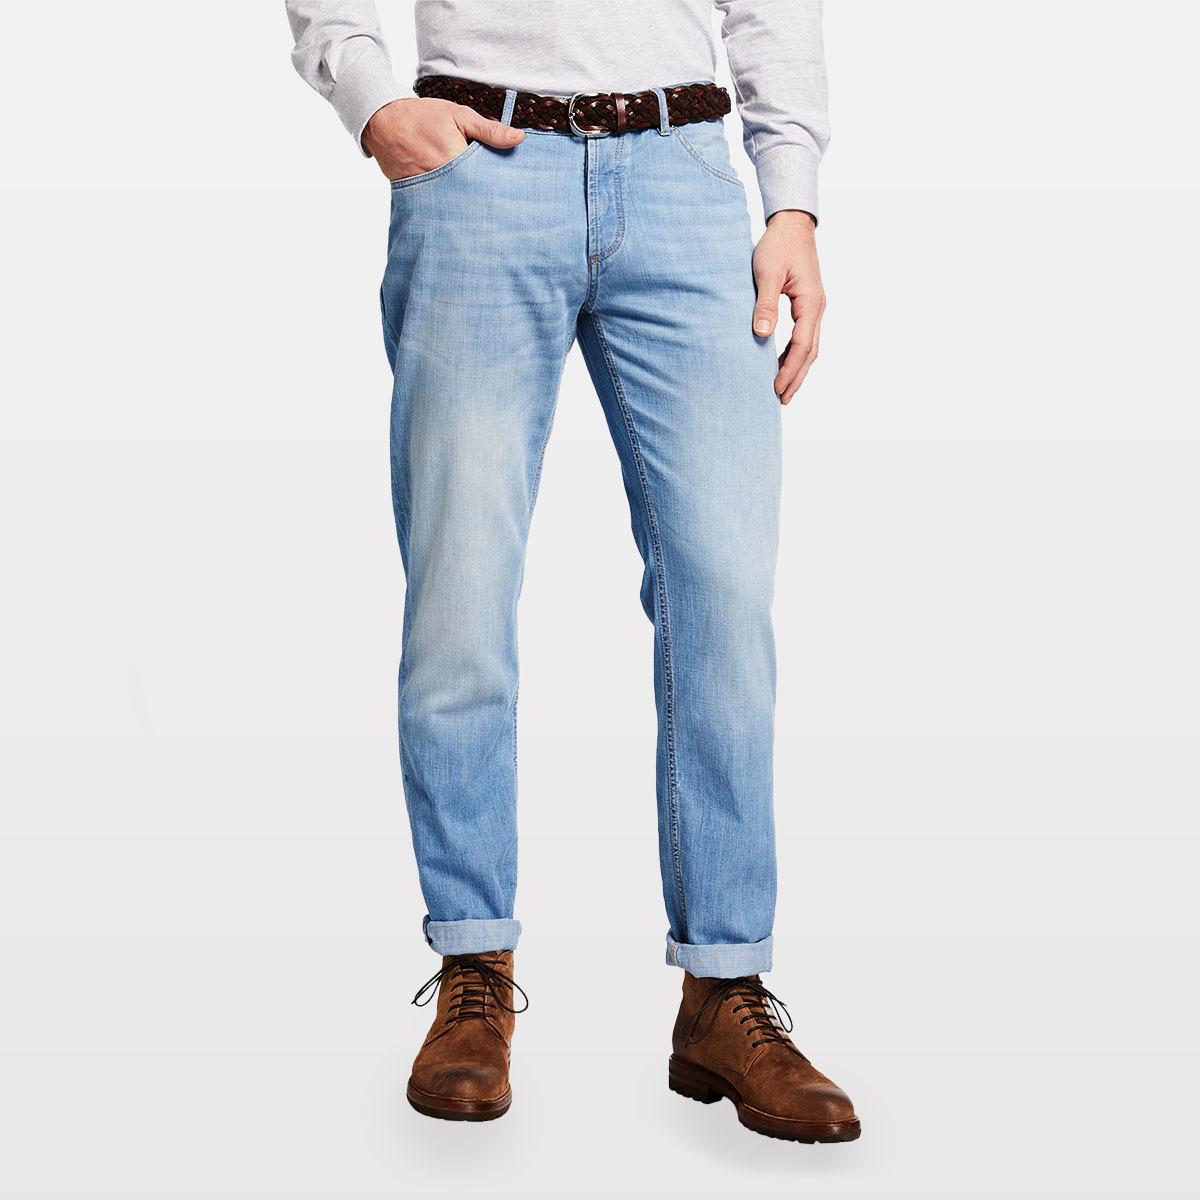 Brunello Cucinelli Men's Traditional-Fit Light-Wash Jeans